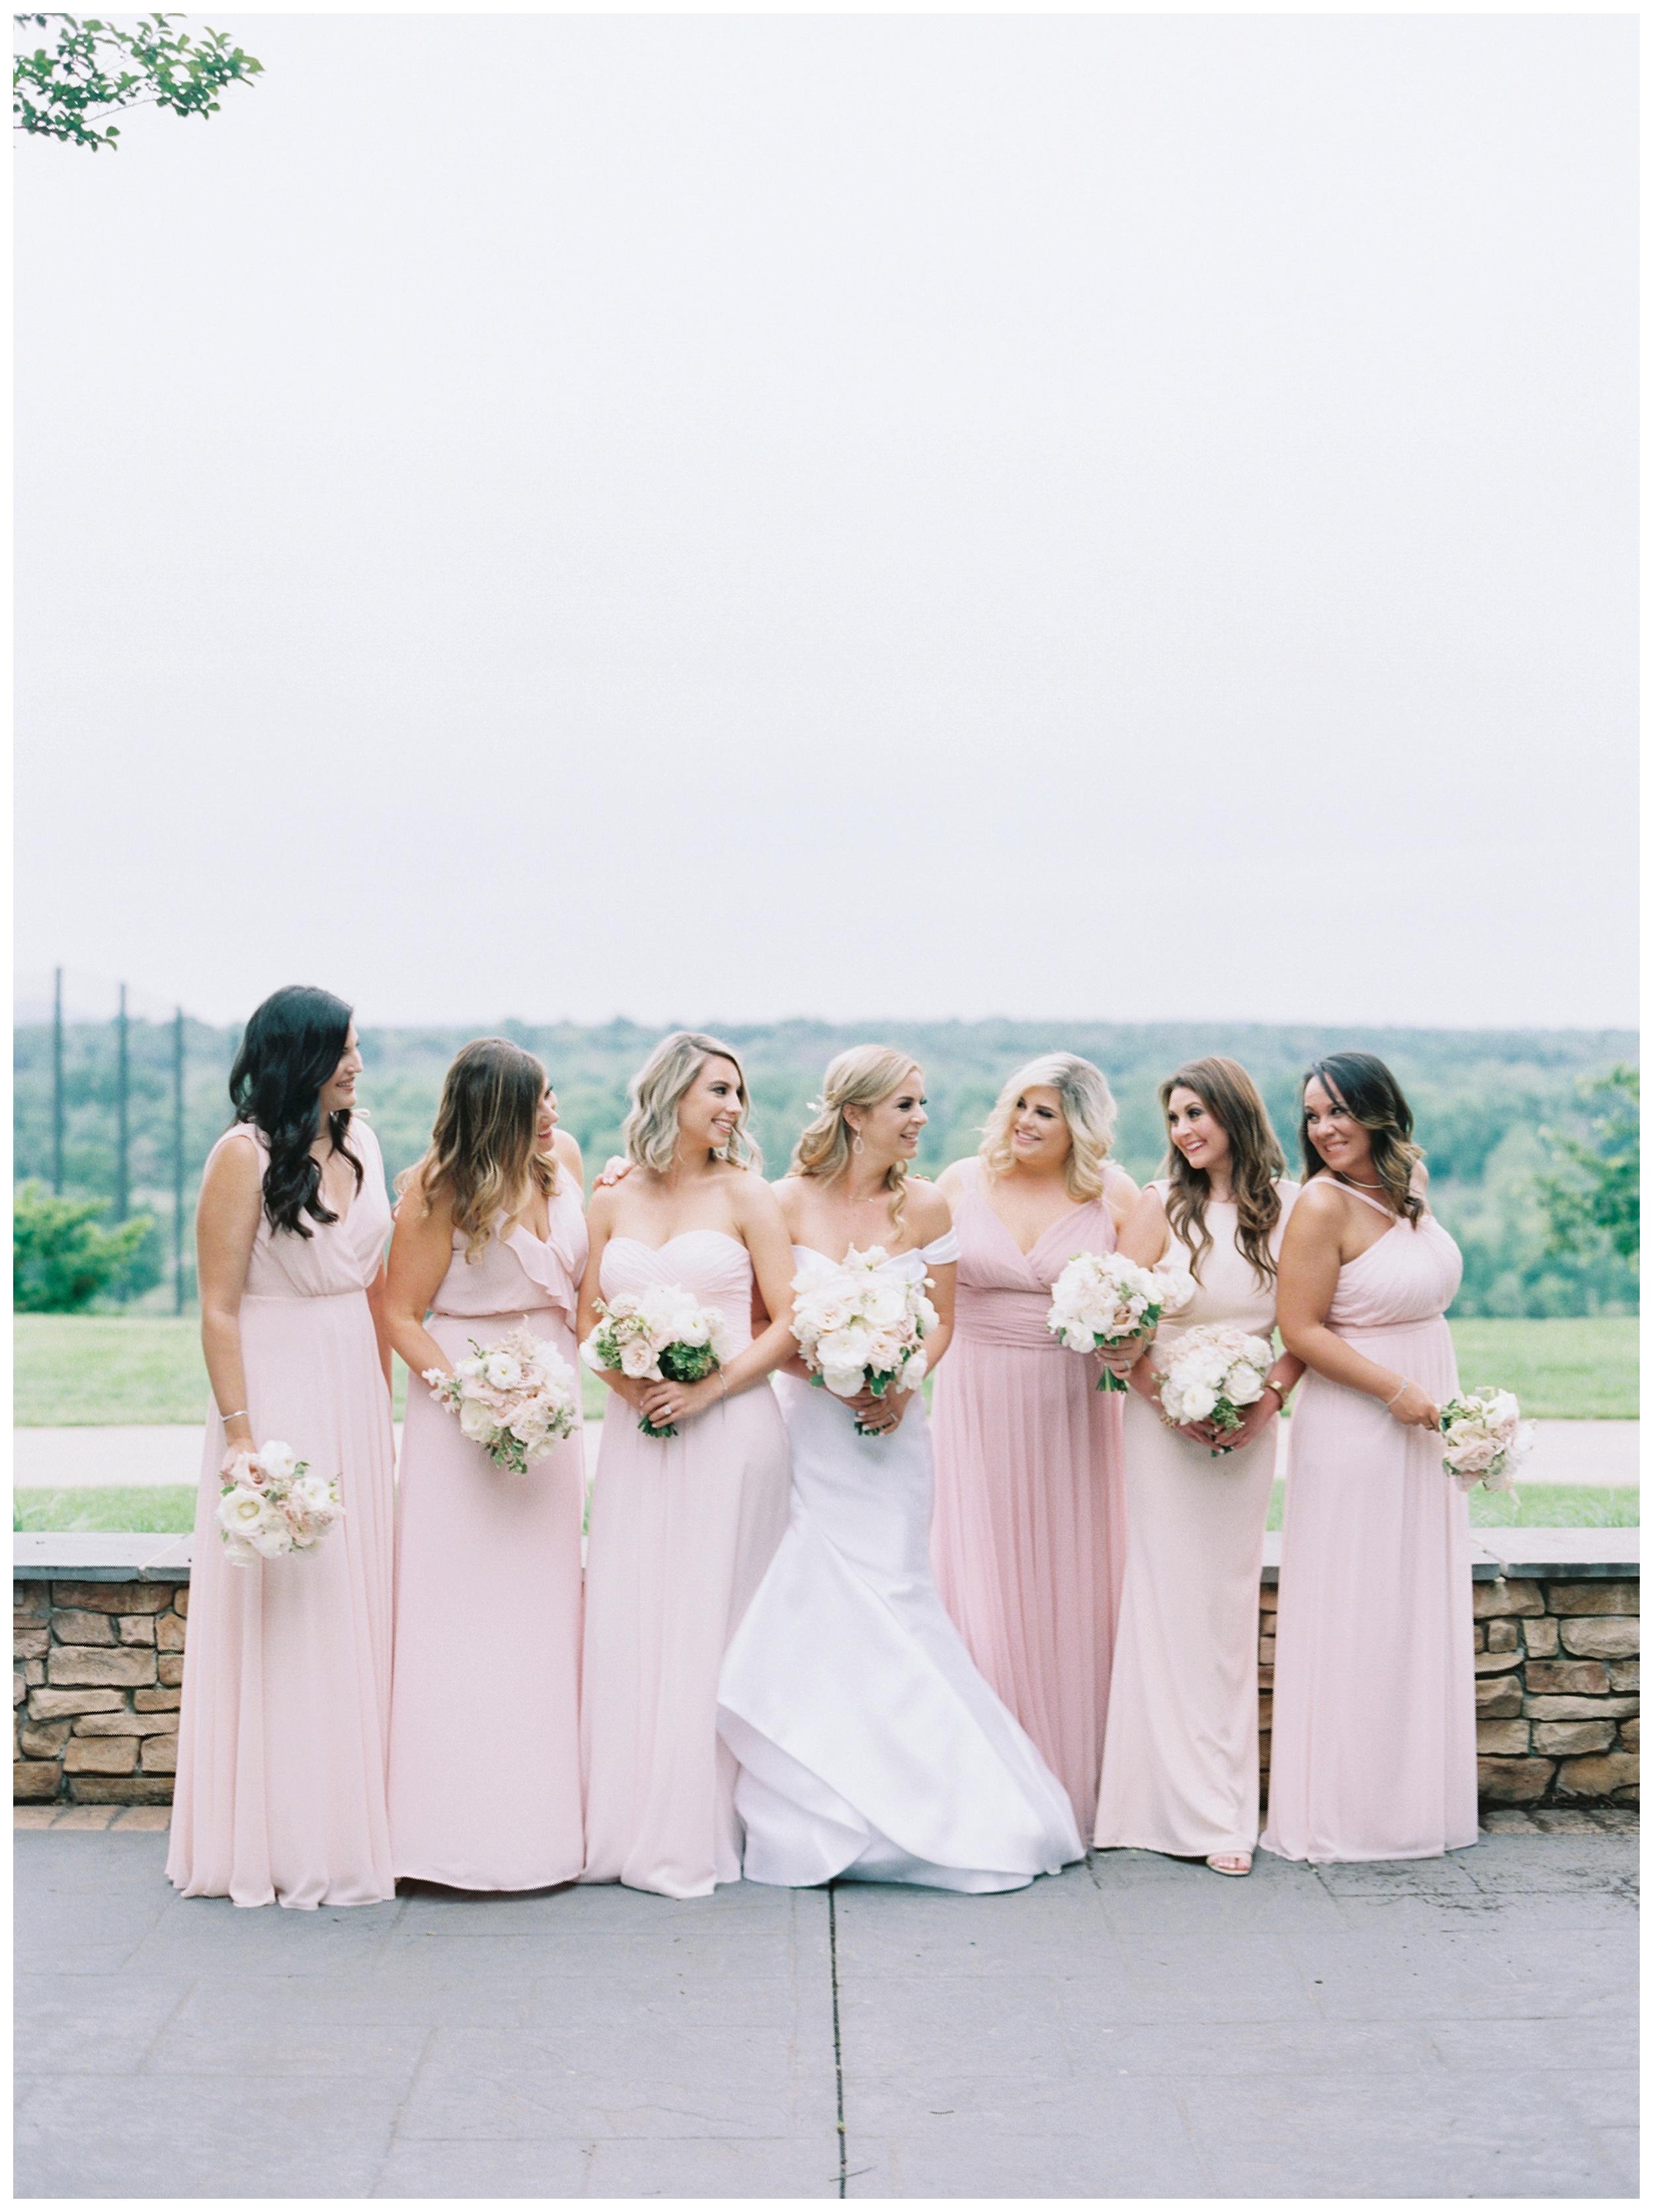 Lansdowne Resort Wedding | Virginia Film Wedding Photographer Kir Tuben_0026.jpg